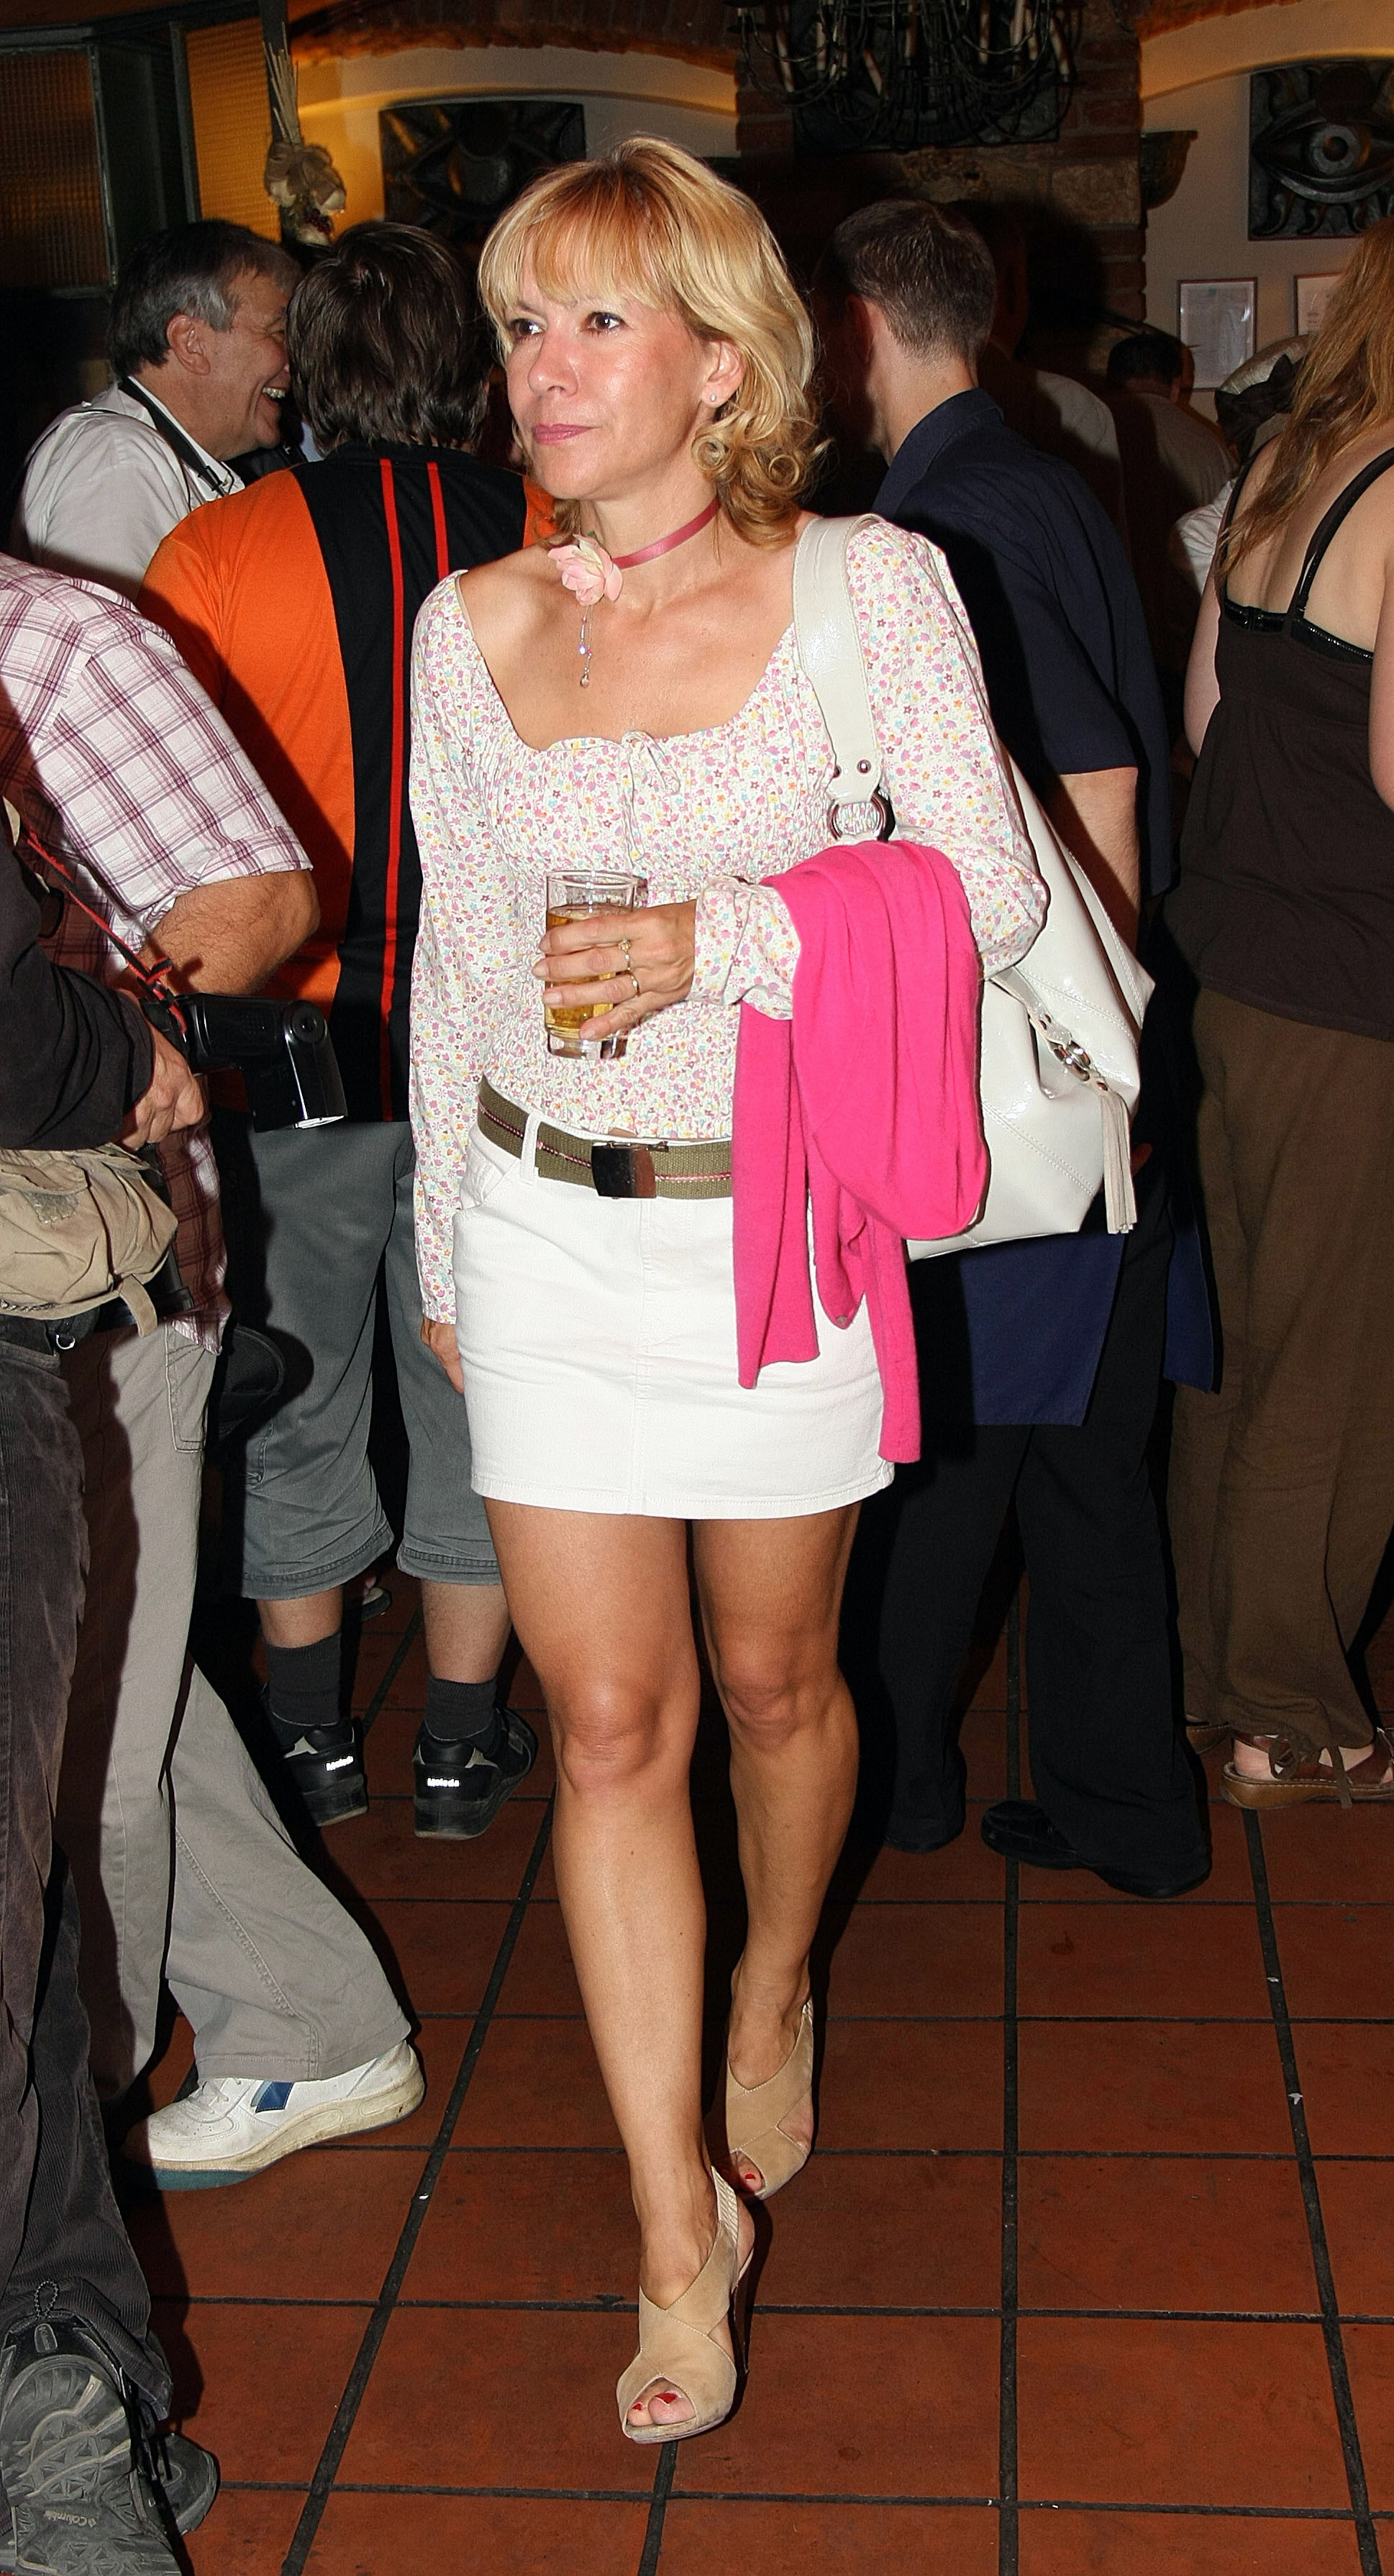 Michaela Dolinova nude (39 photo), Topless, Sideboobs, Feet, swimsuit 2006